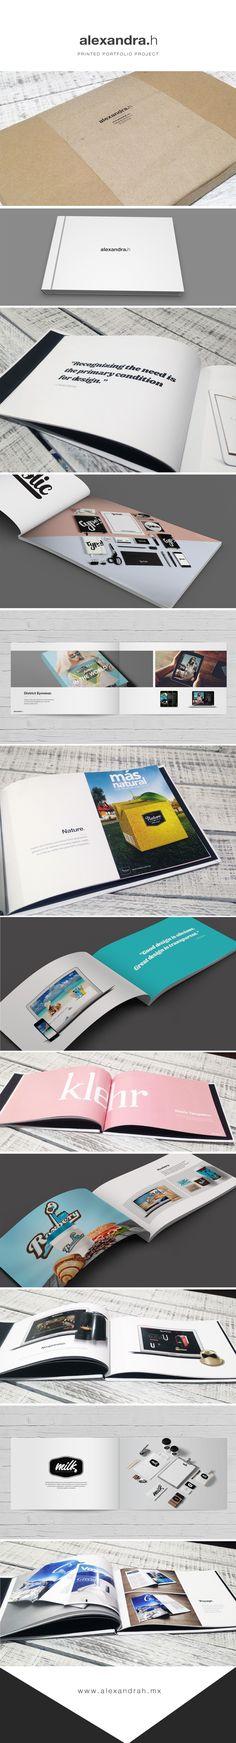 Printed portfolio project #graphicdesign #book #bookdesign Book Design, My Design, Graphic Design, Printed Portfolio, Projects, Books, Prints, Log Projects, Blue Prints